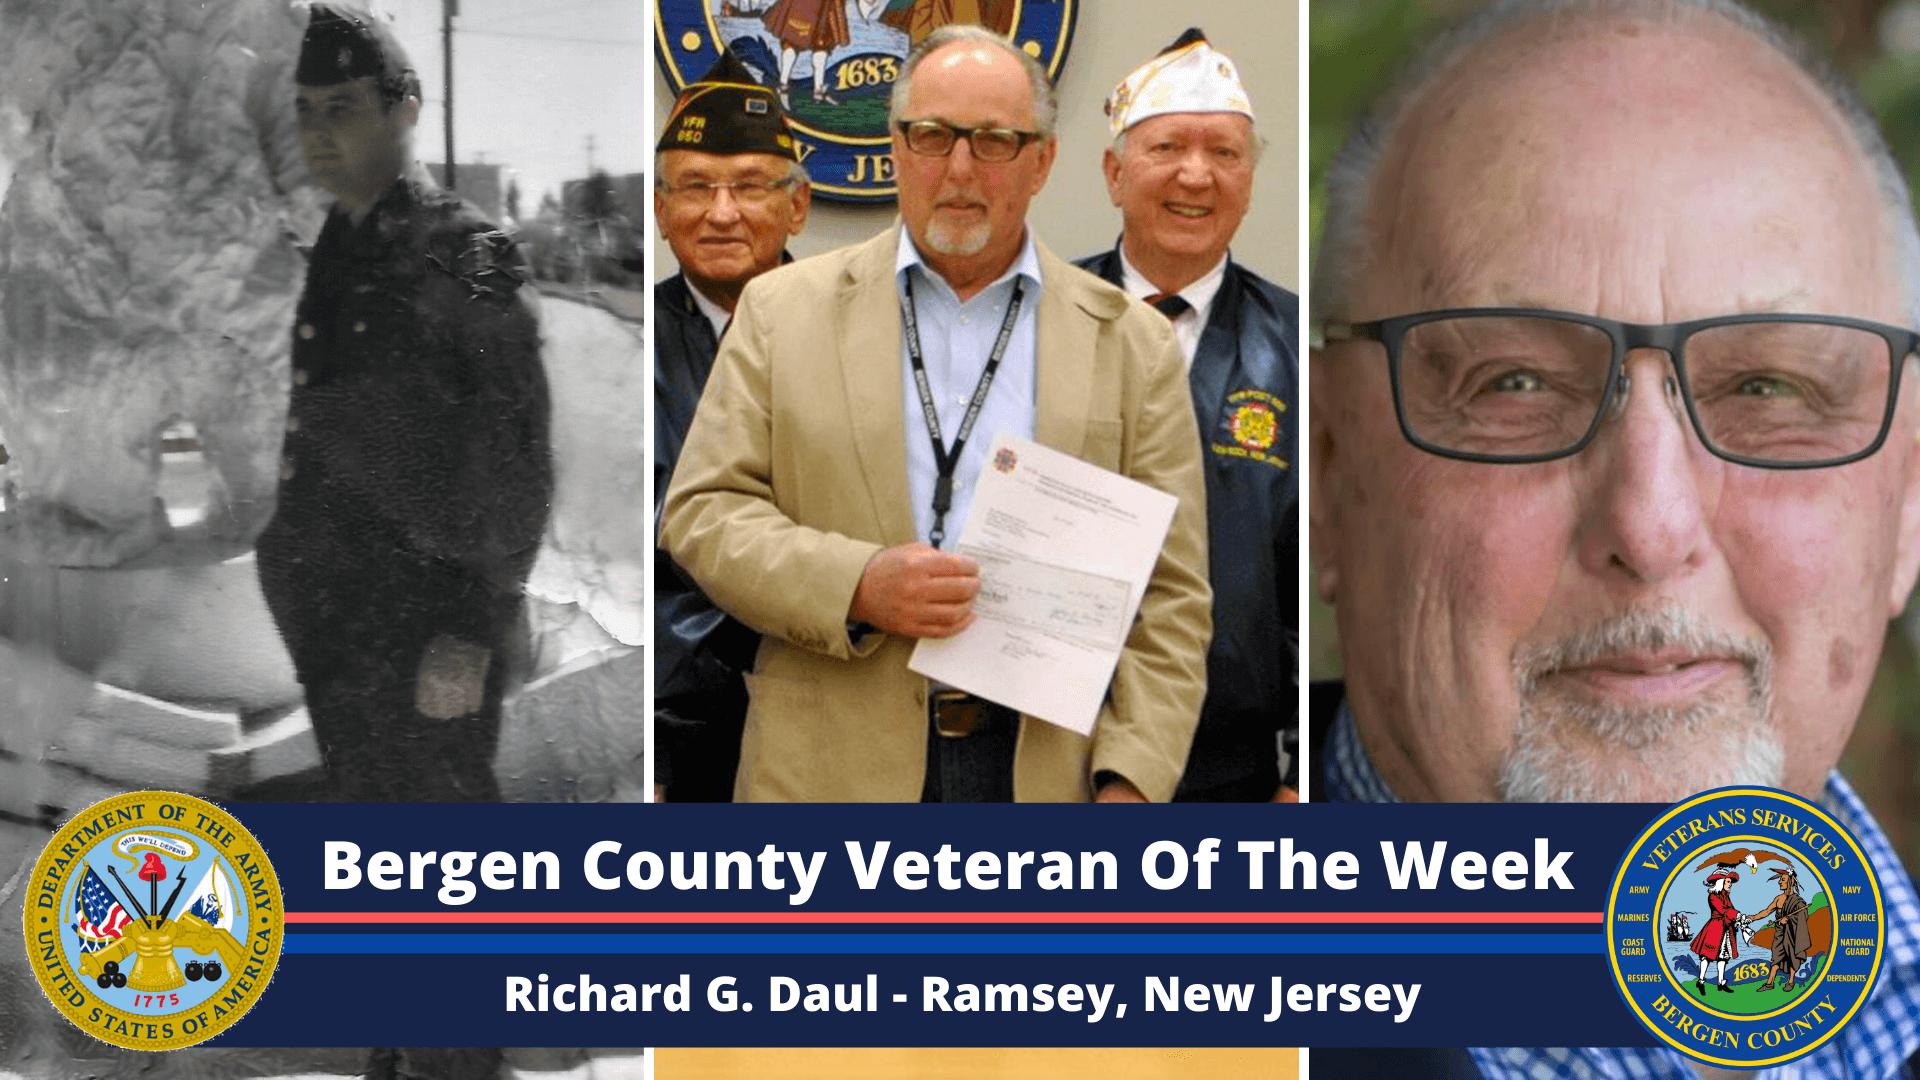 Bergen County Veteran of the Week: Richard G. Daul